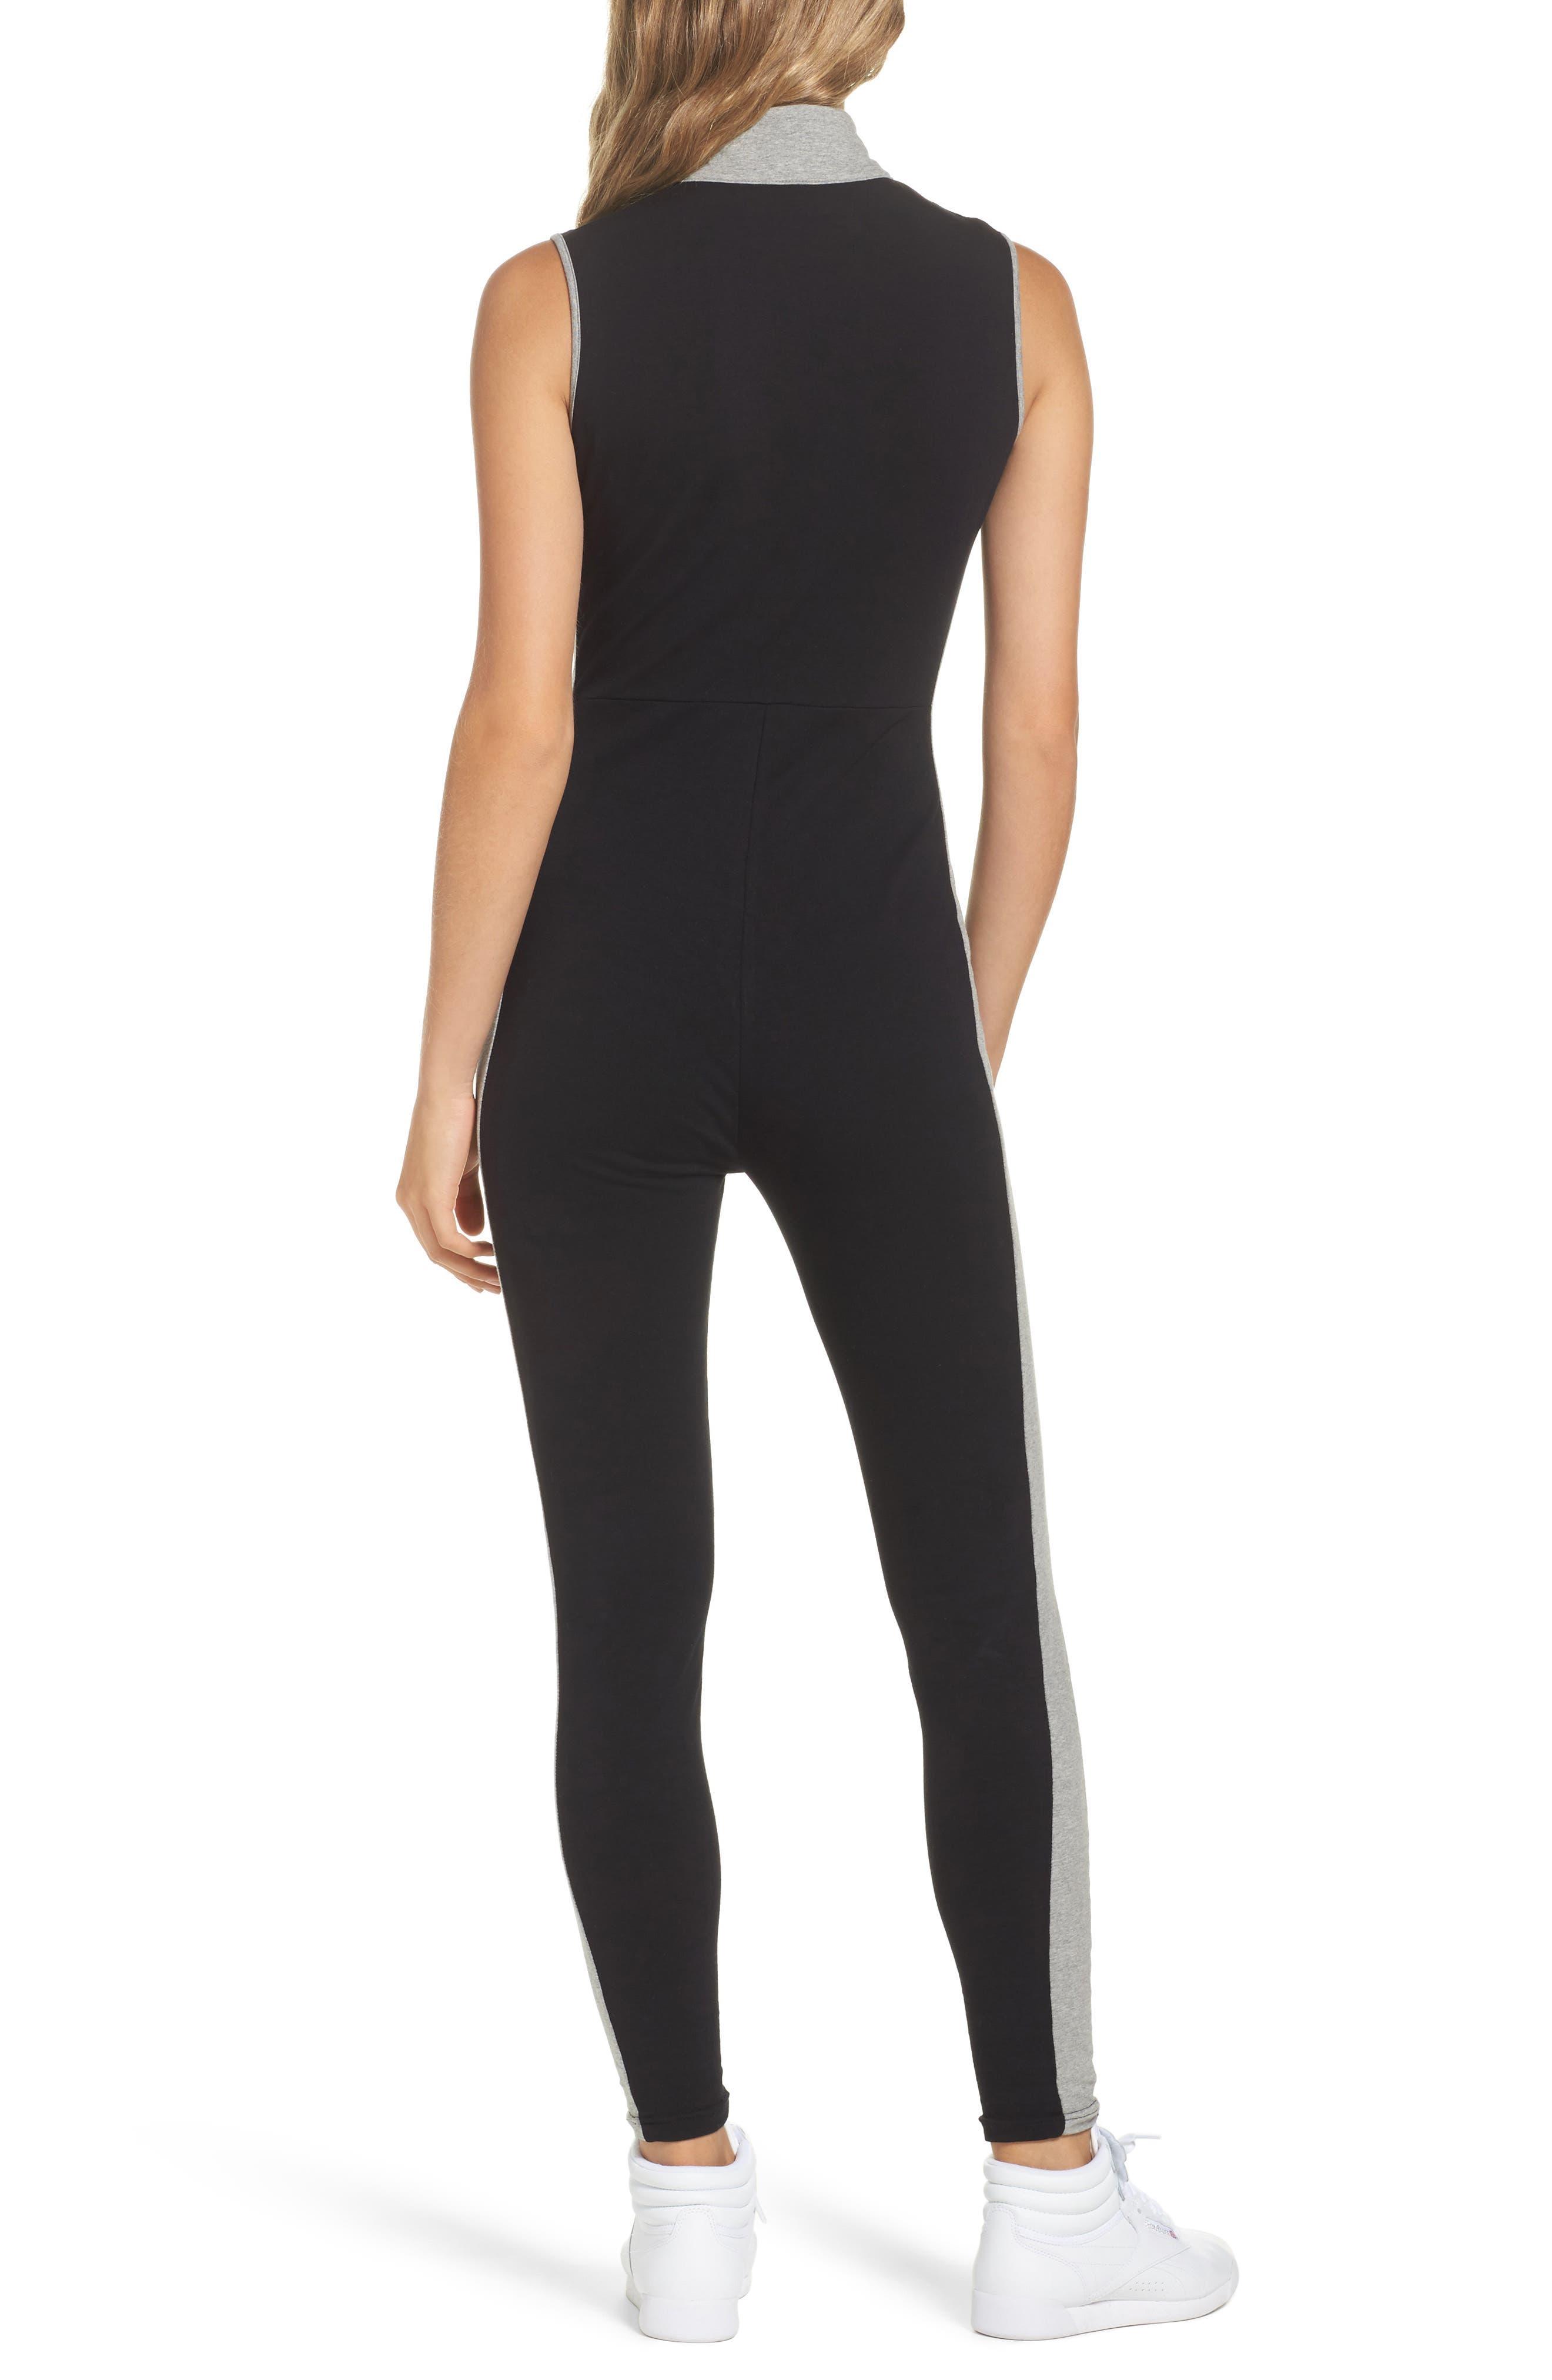 Roseann Jumpsuit,                             Alternate thumbnail 2, color,                             Black/ Grey Heather/ White